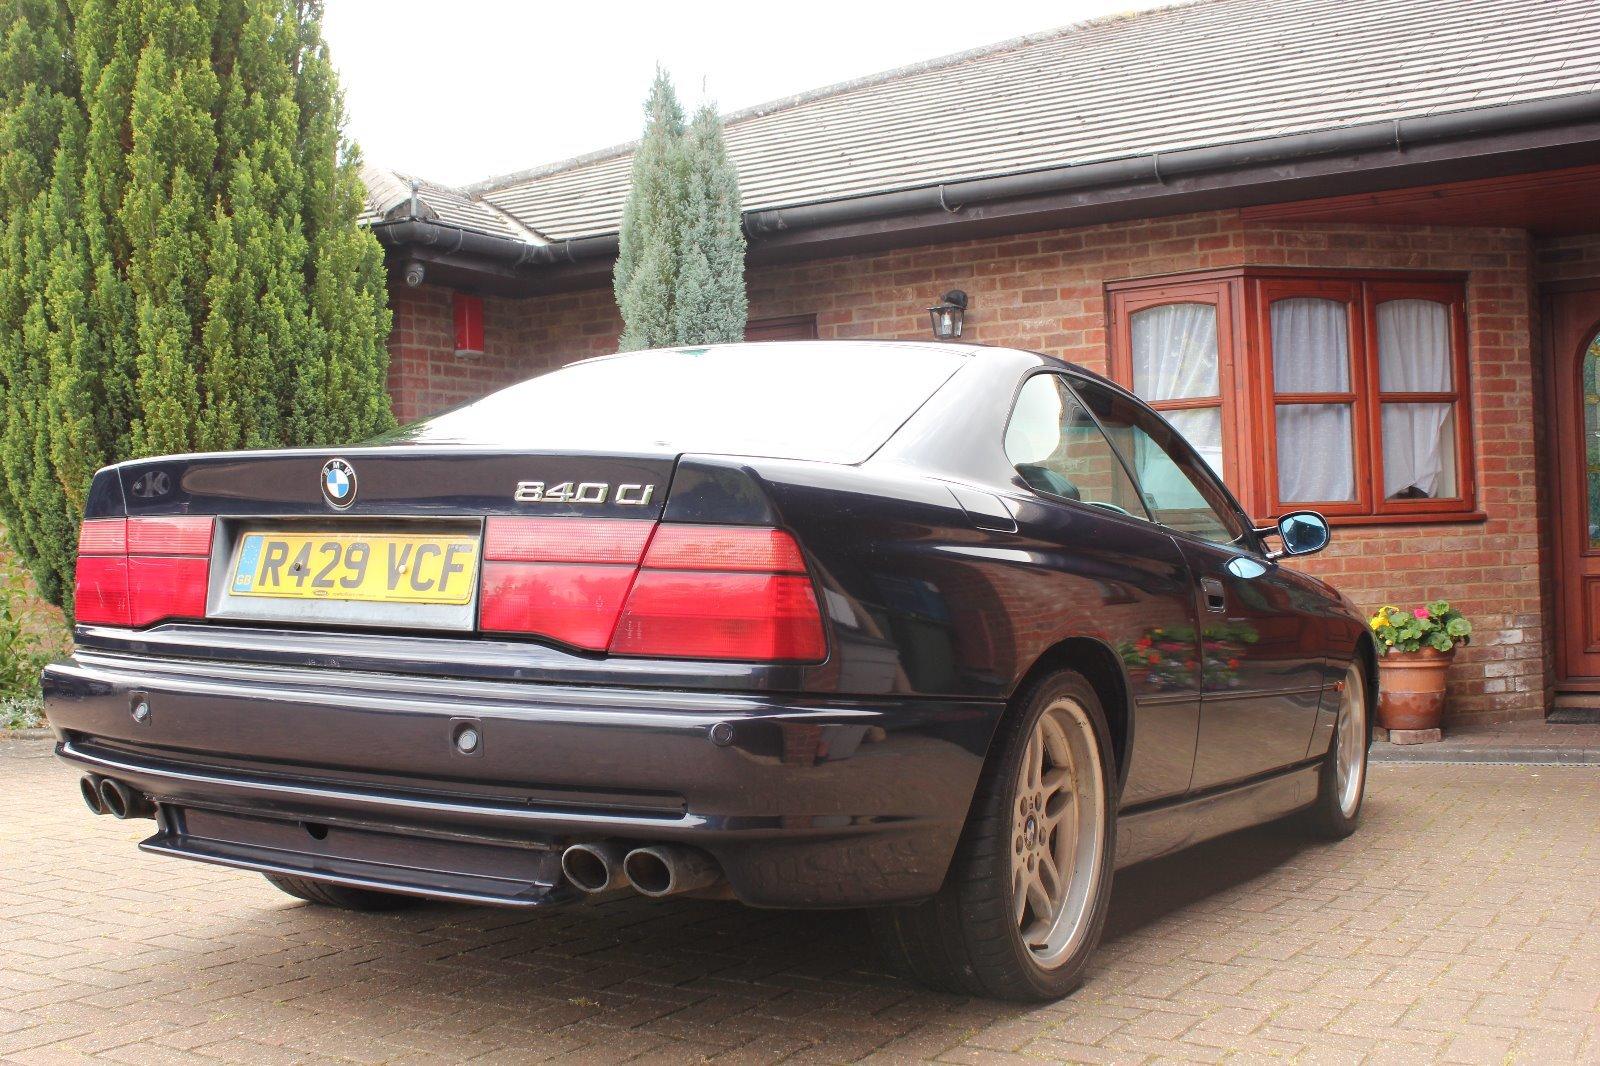 1998 BMW 840CI SPORT INDIVIDUAL 4.4 840 Ci E31 For Sale (picture 1 of 6)